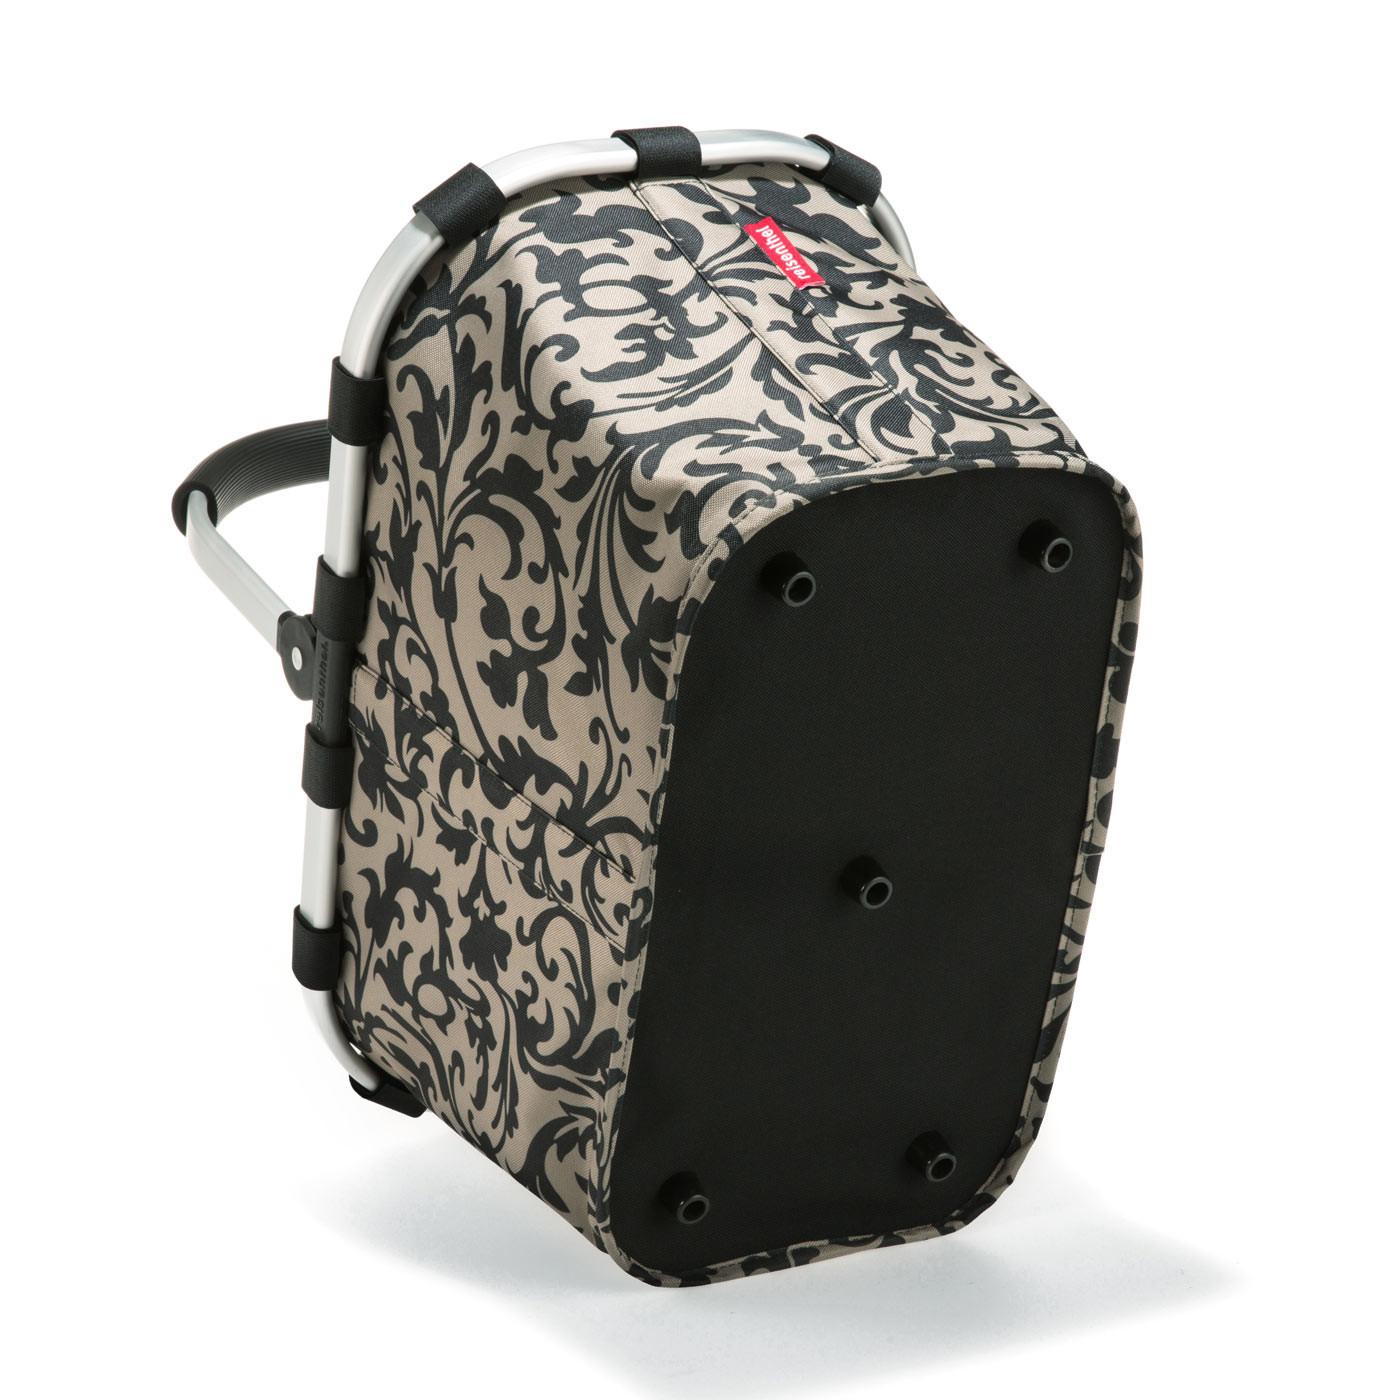 Reisenthel Carrybag 22l baroque taupe im Suhl Online Shop